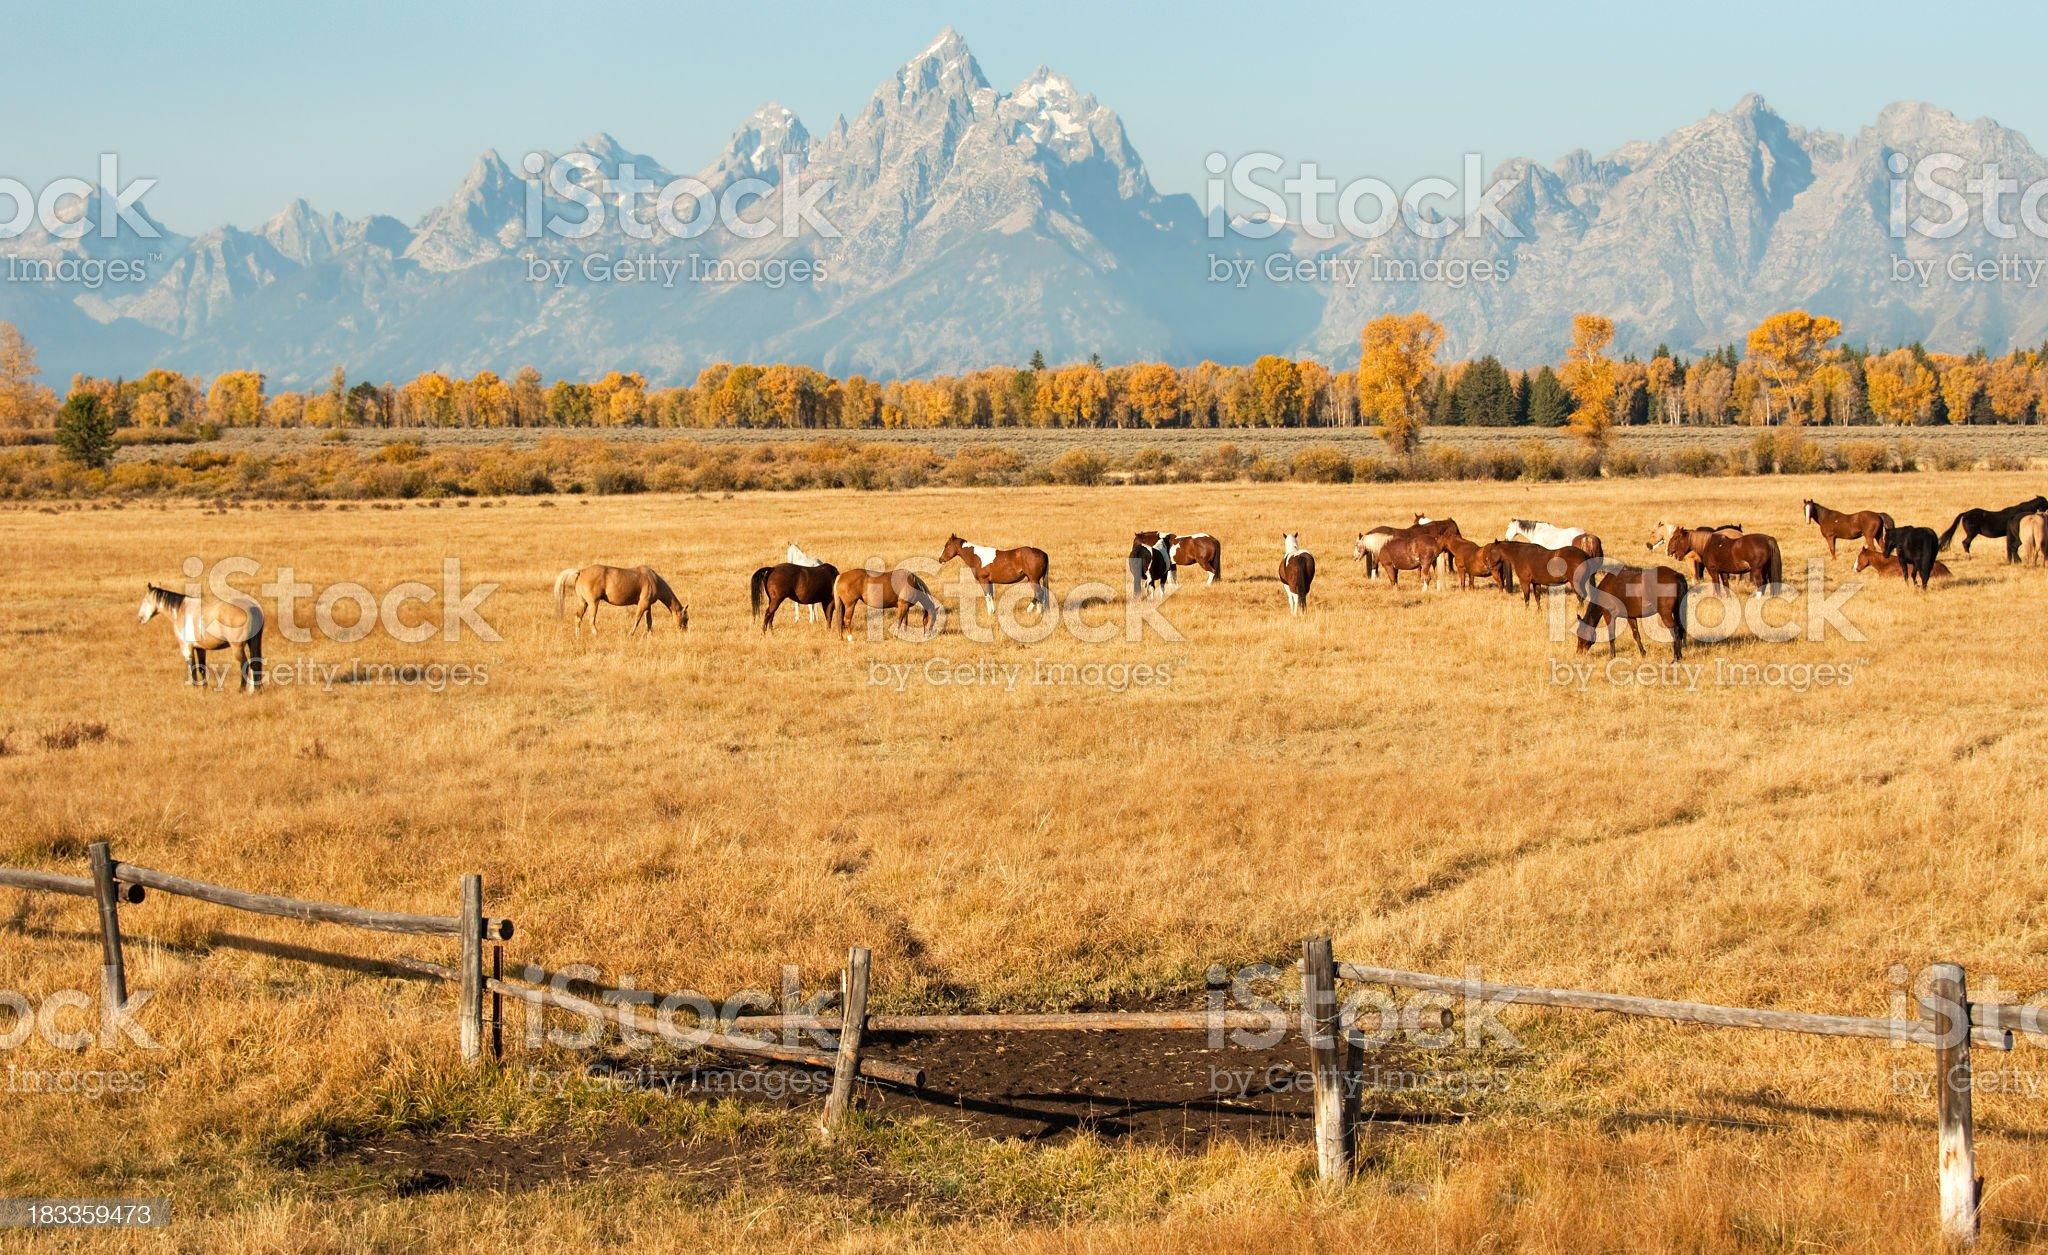 Wyoming Horse Ranch - Teton Range in the background royalty-free stock photo